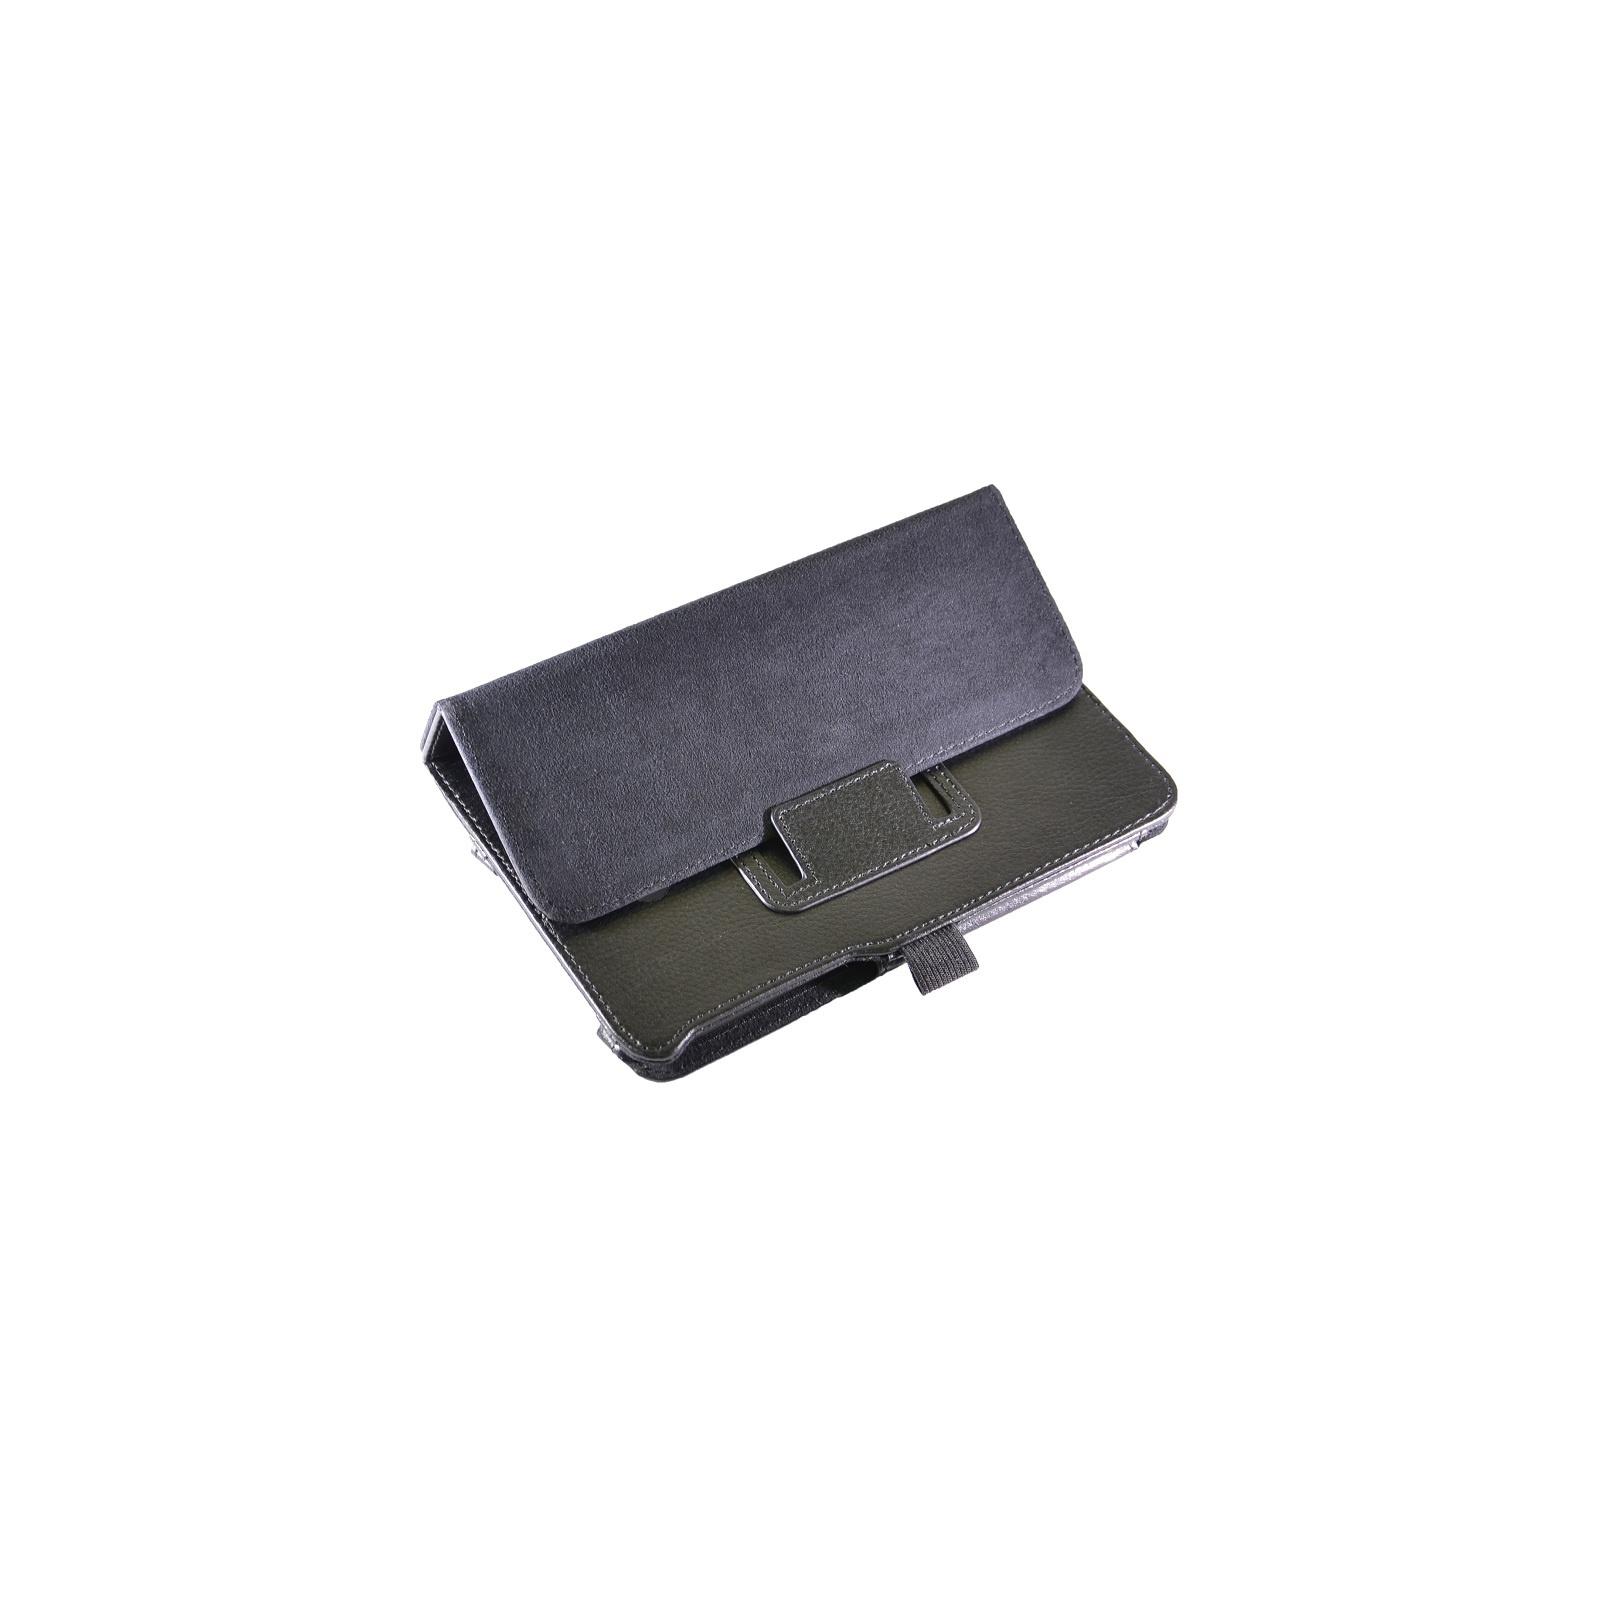 "Чехол для планшета Pro-case 7"" Pro-case Asus 7"" MeMO Pad ME170 black (ME170b) изображение 3"